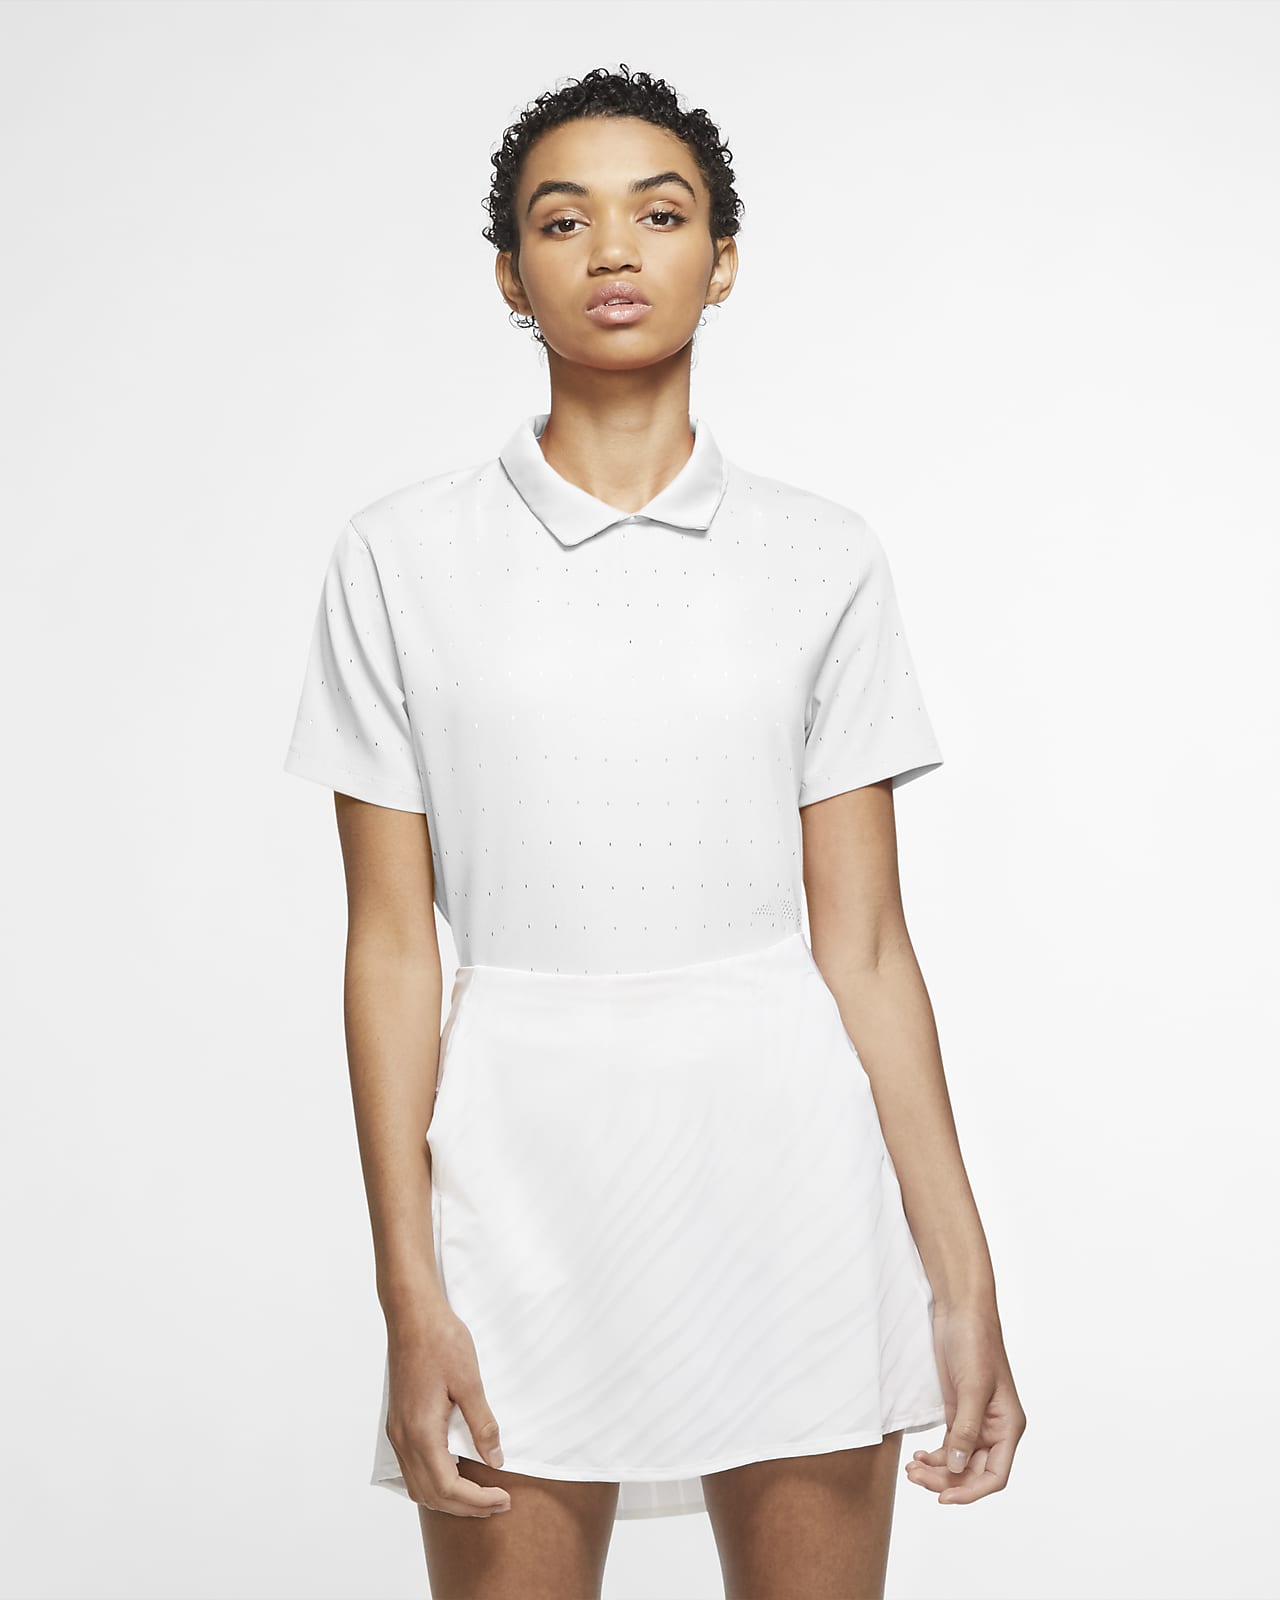 Nike Dri-FIT Ace-Golf-Poloshirt für Damen